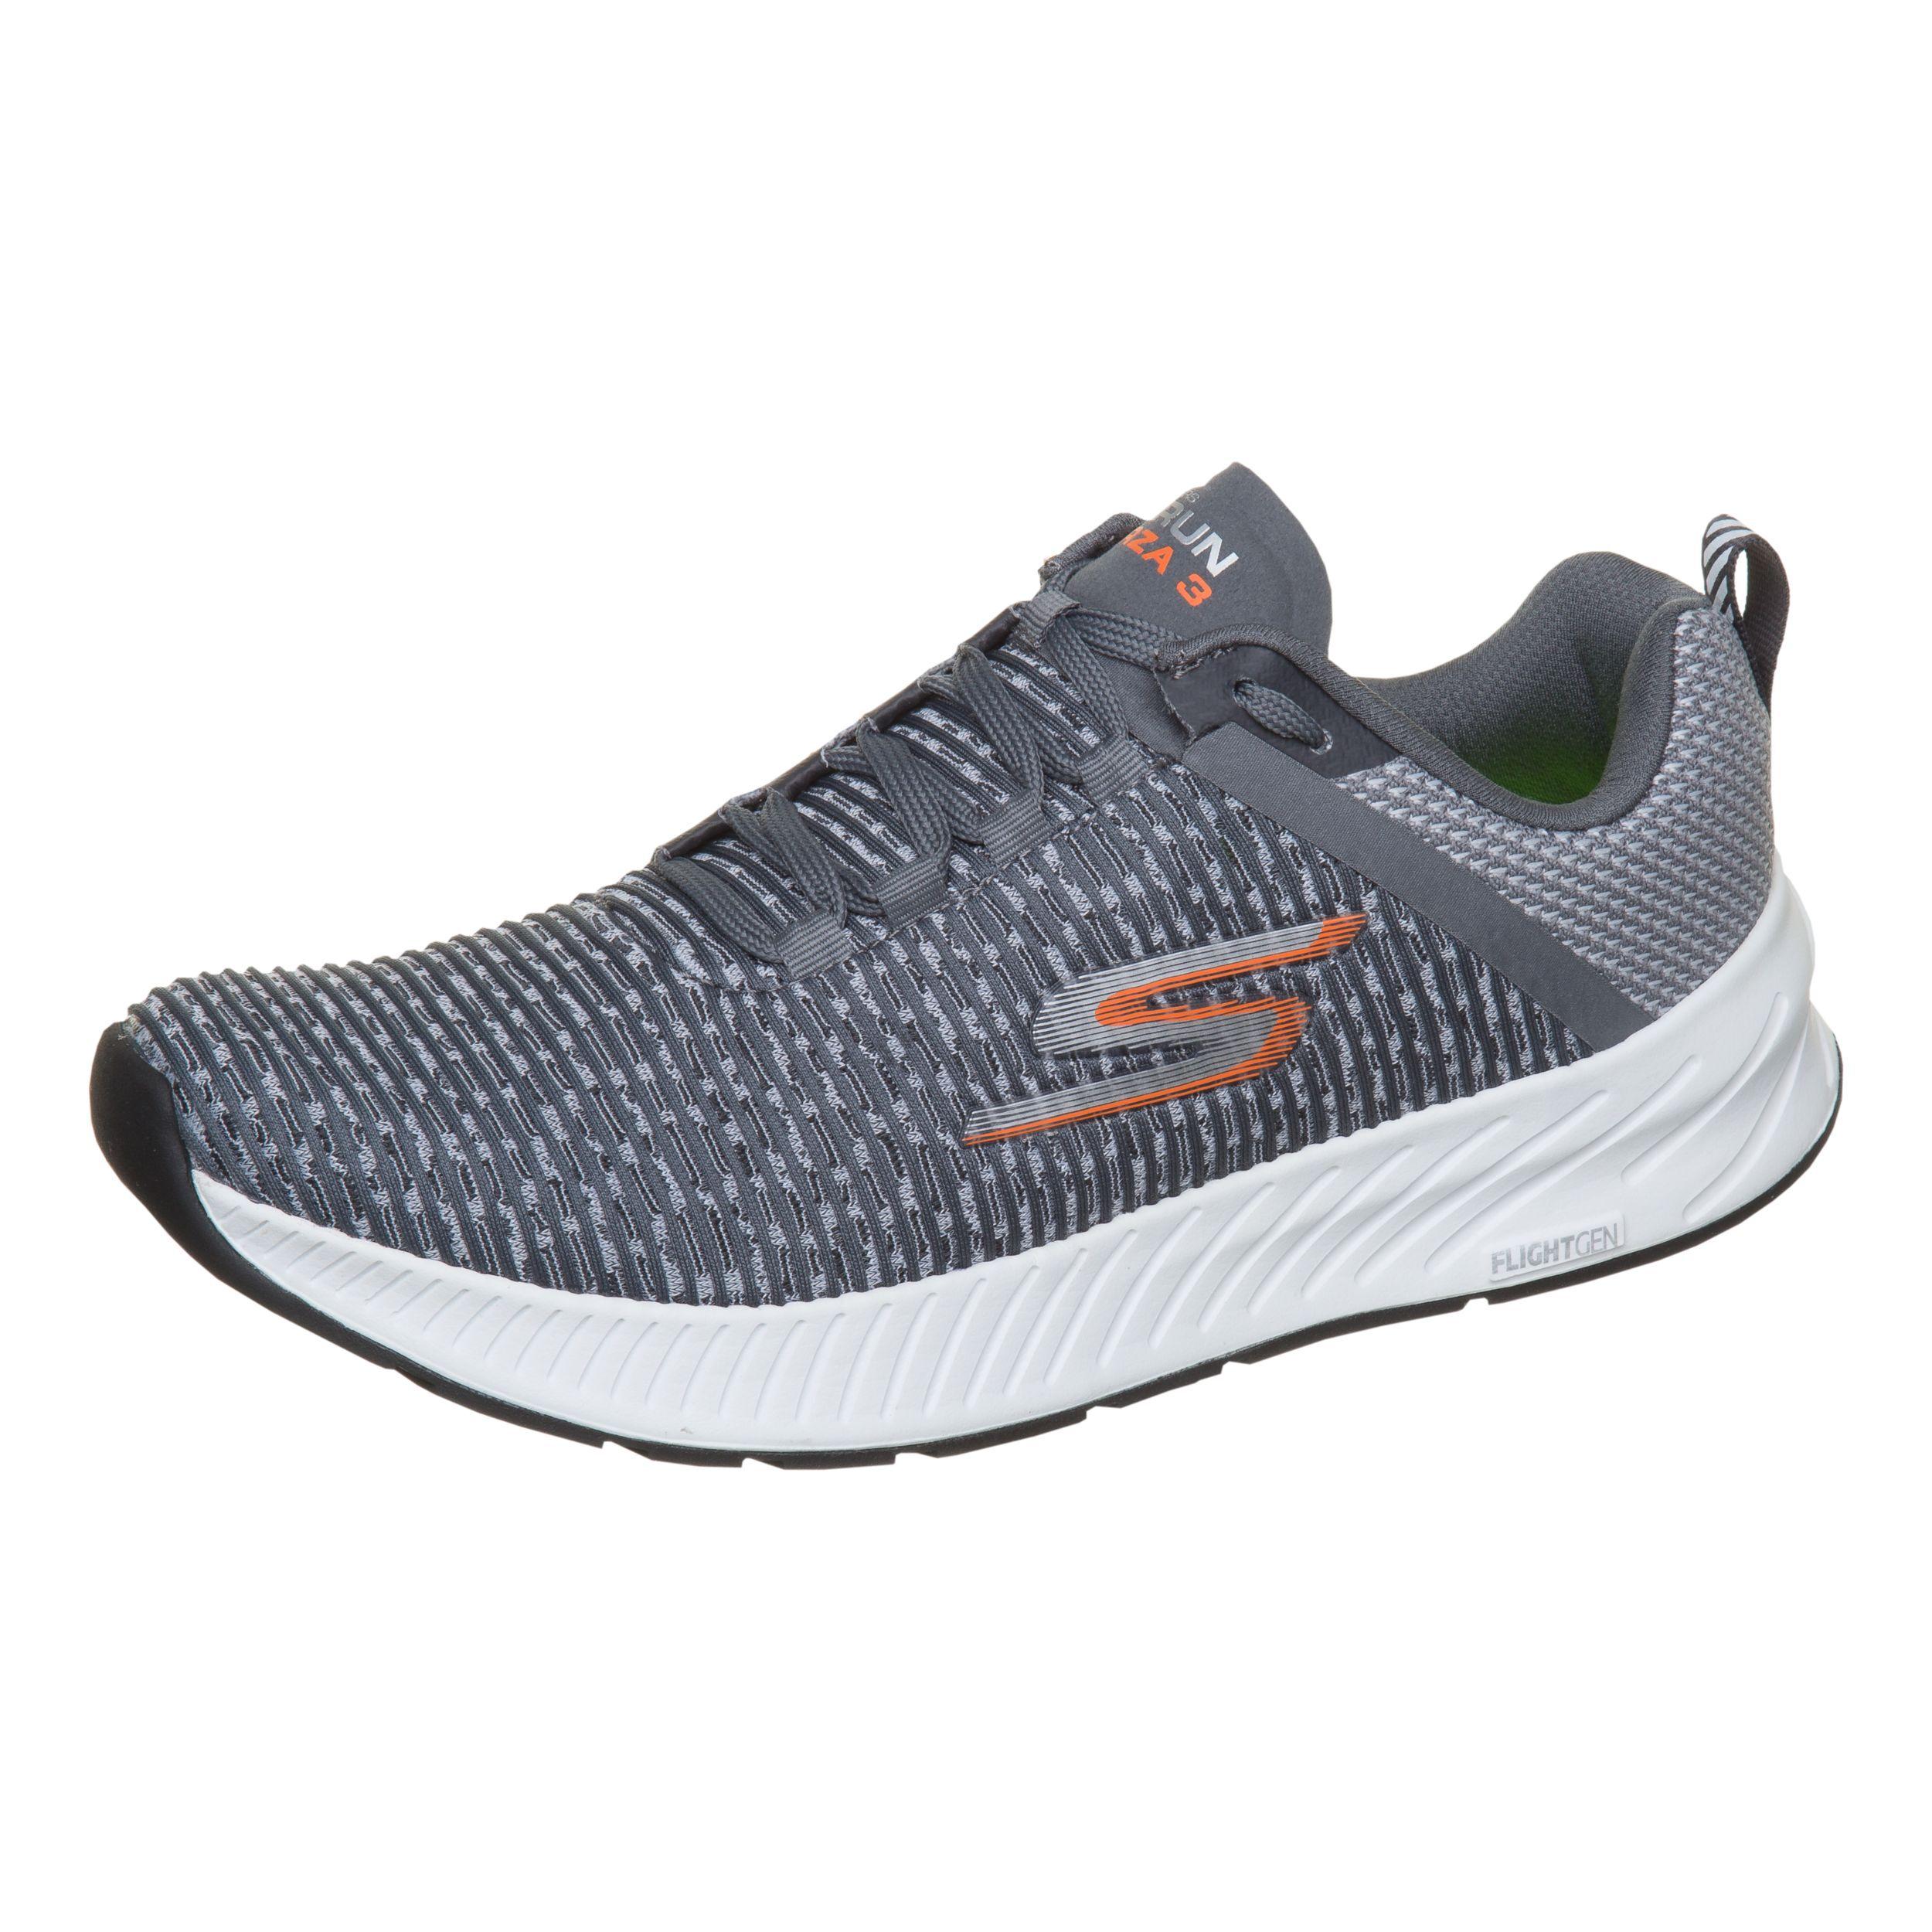 169d162f8 Buy Skechers Go Run Forza 3 Stability Running Shoe Men Grey